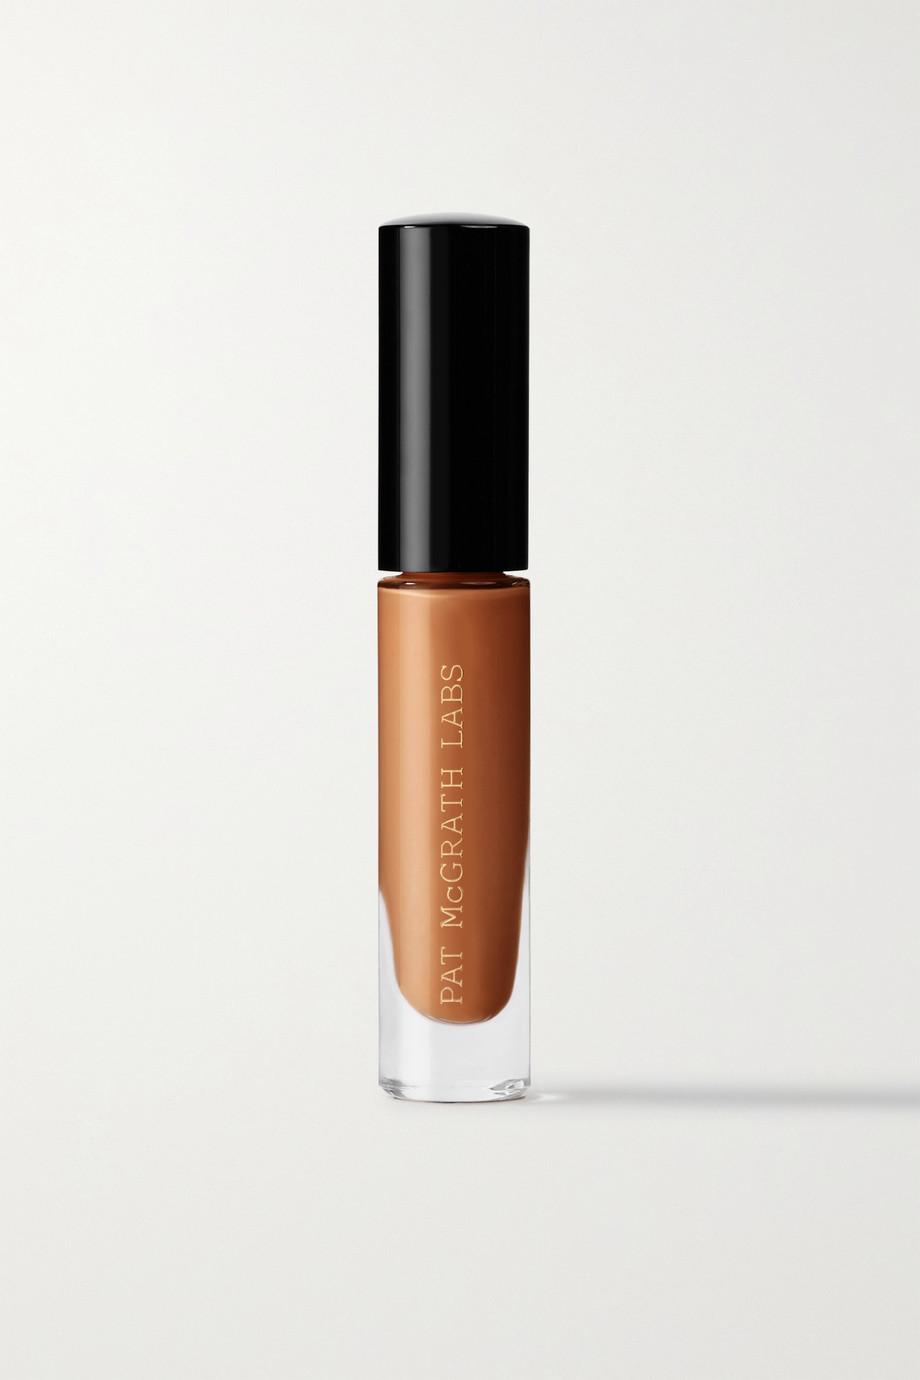 Pat McGrath Labs Skin Fetish: Sublime Perfection Concealer - MD23, 5ml